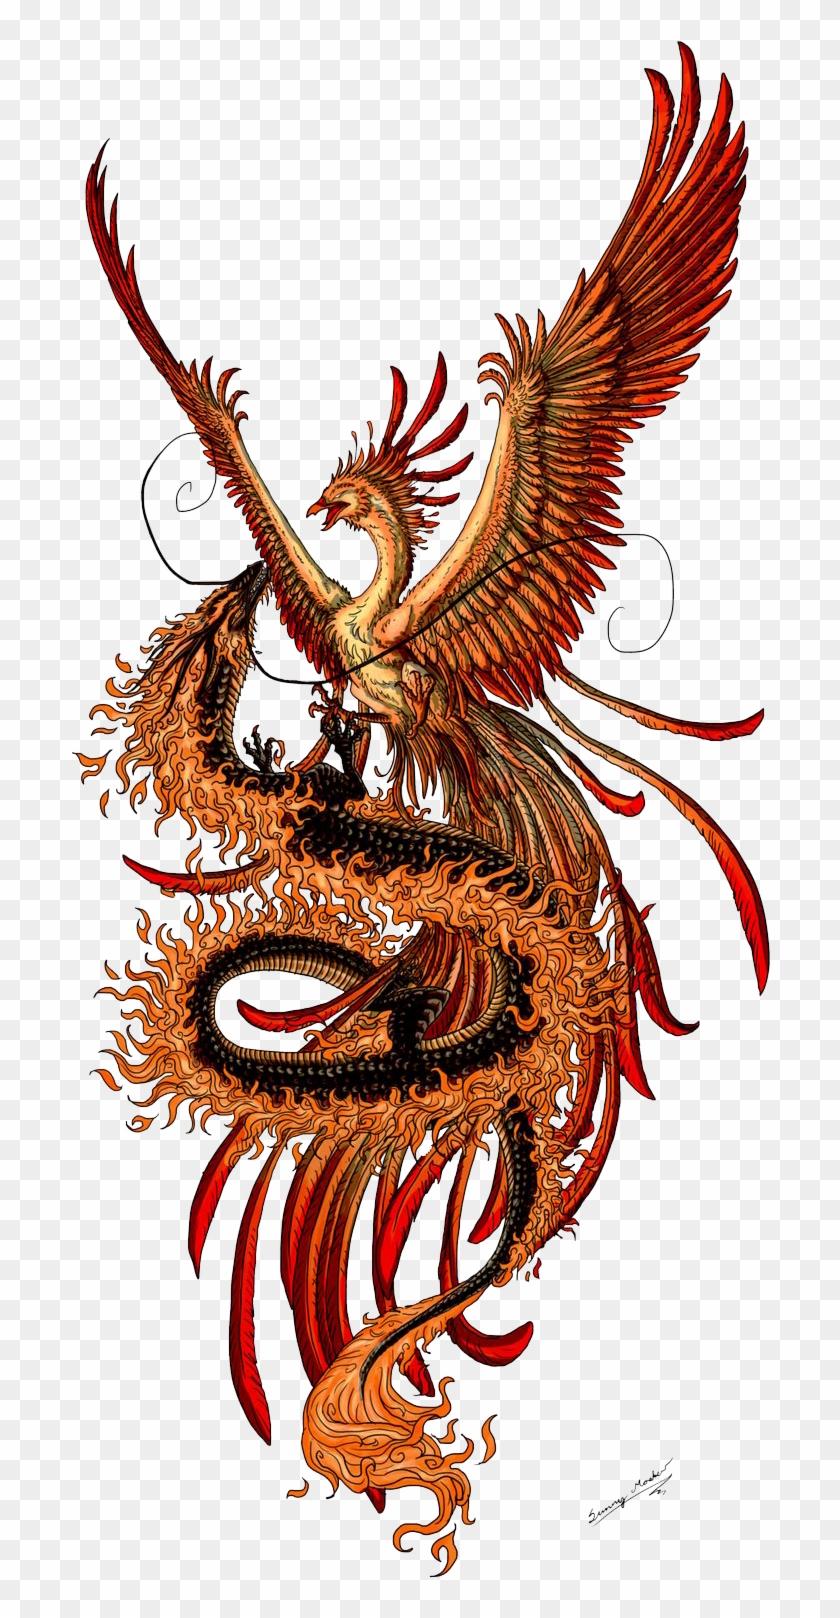 Vermilion Bird Google Search Tattoo Dragon And Phoenix Phoenix Tattoo Phoenix Drawing